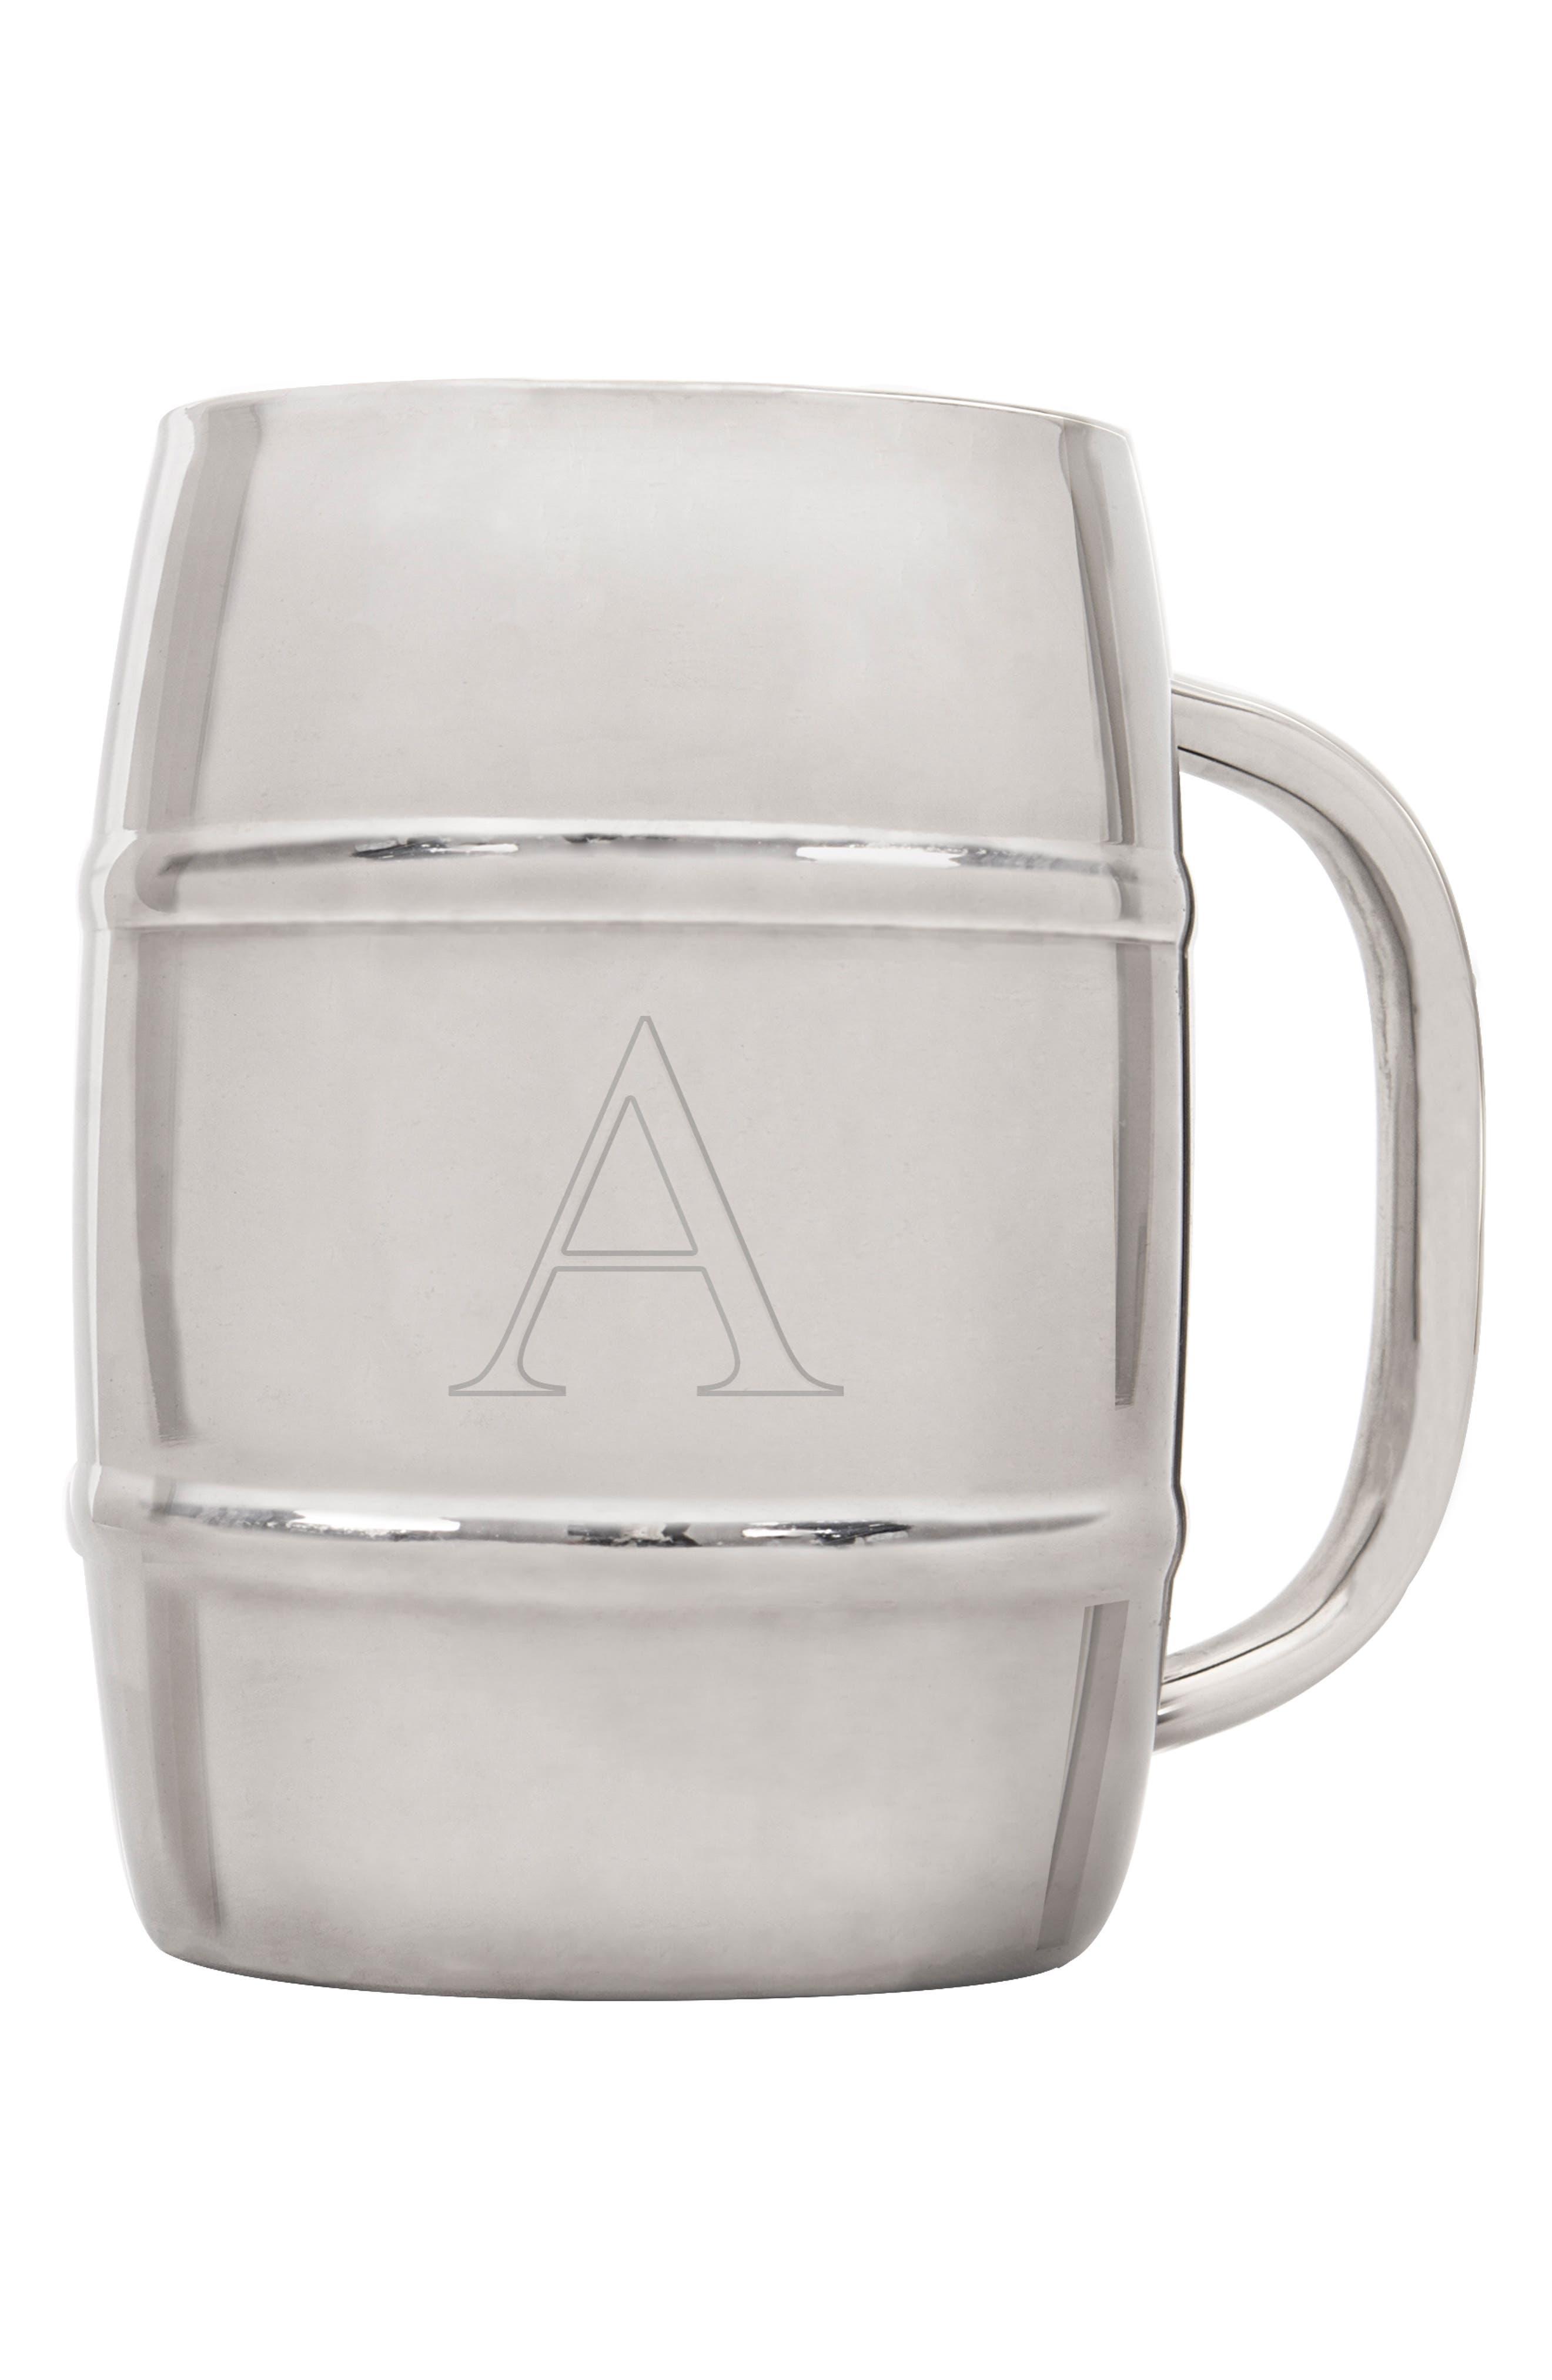 'XL Beer Keg' Monogram Mug,                             Main thumbnail 1, color,                             041